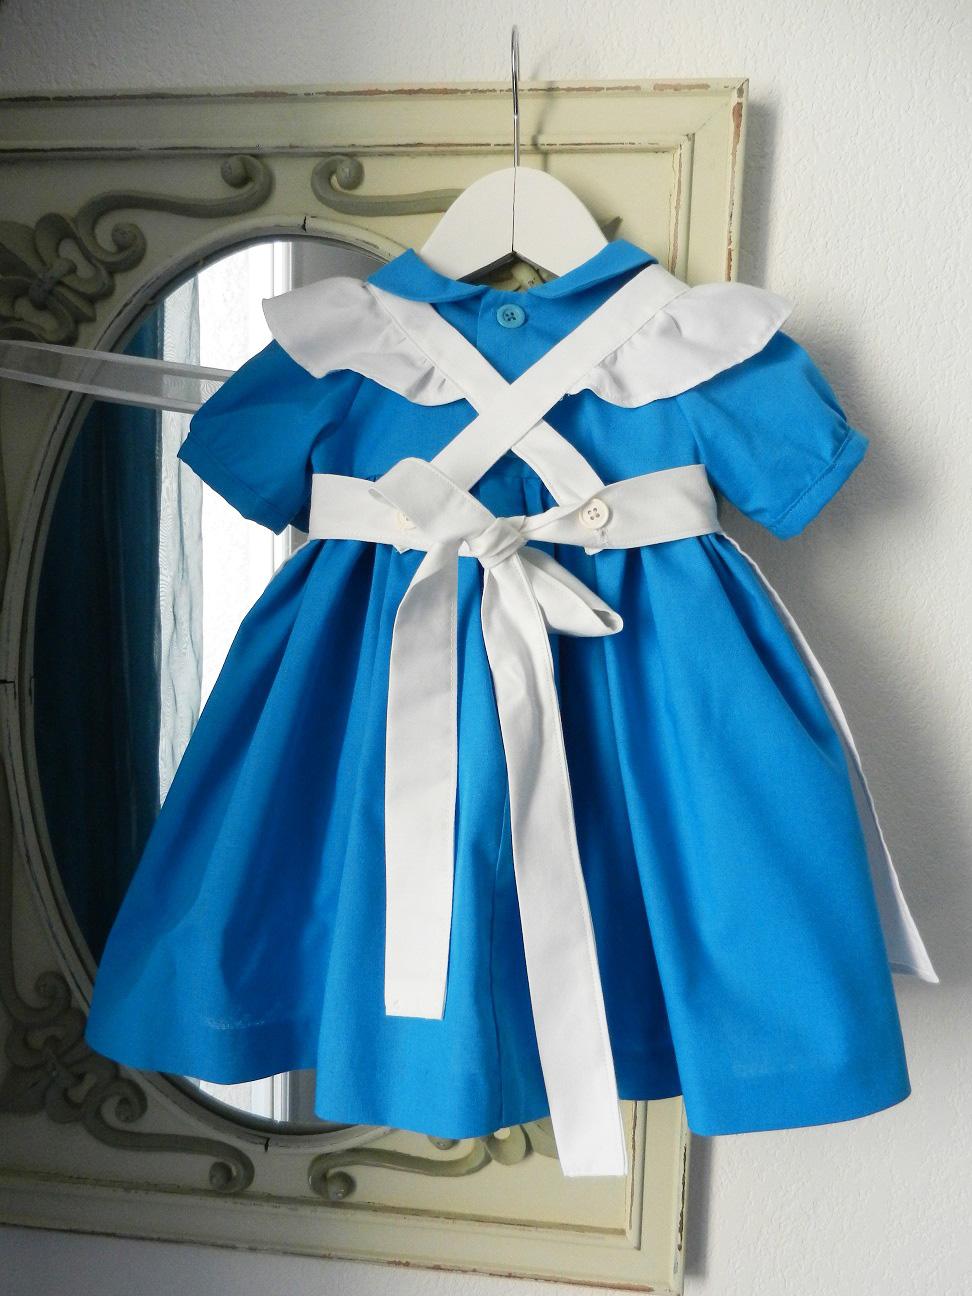 Duchesse or ange 190 robe bleue alice tablier blanc jupon blue dress white apron petticoat h